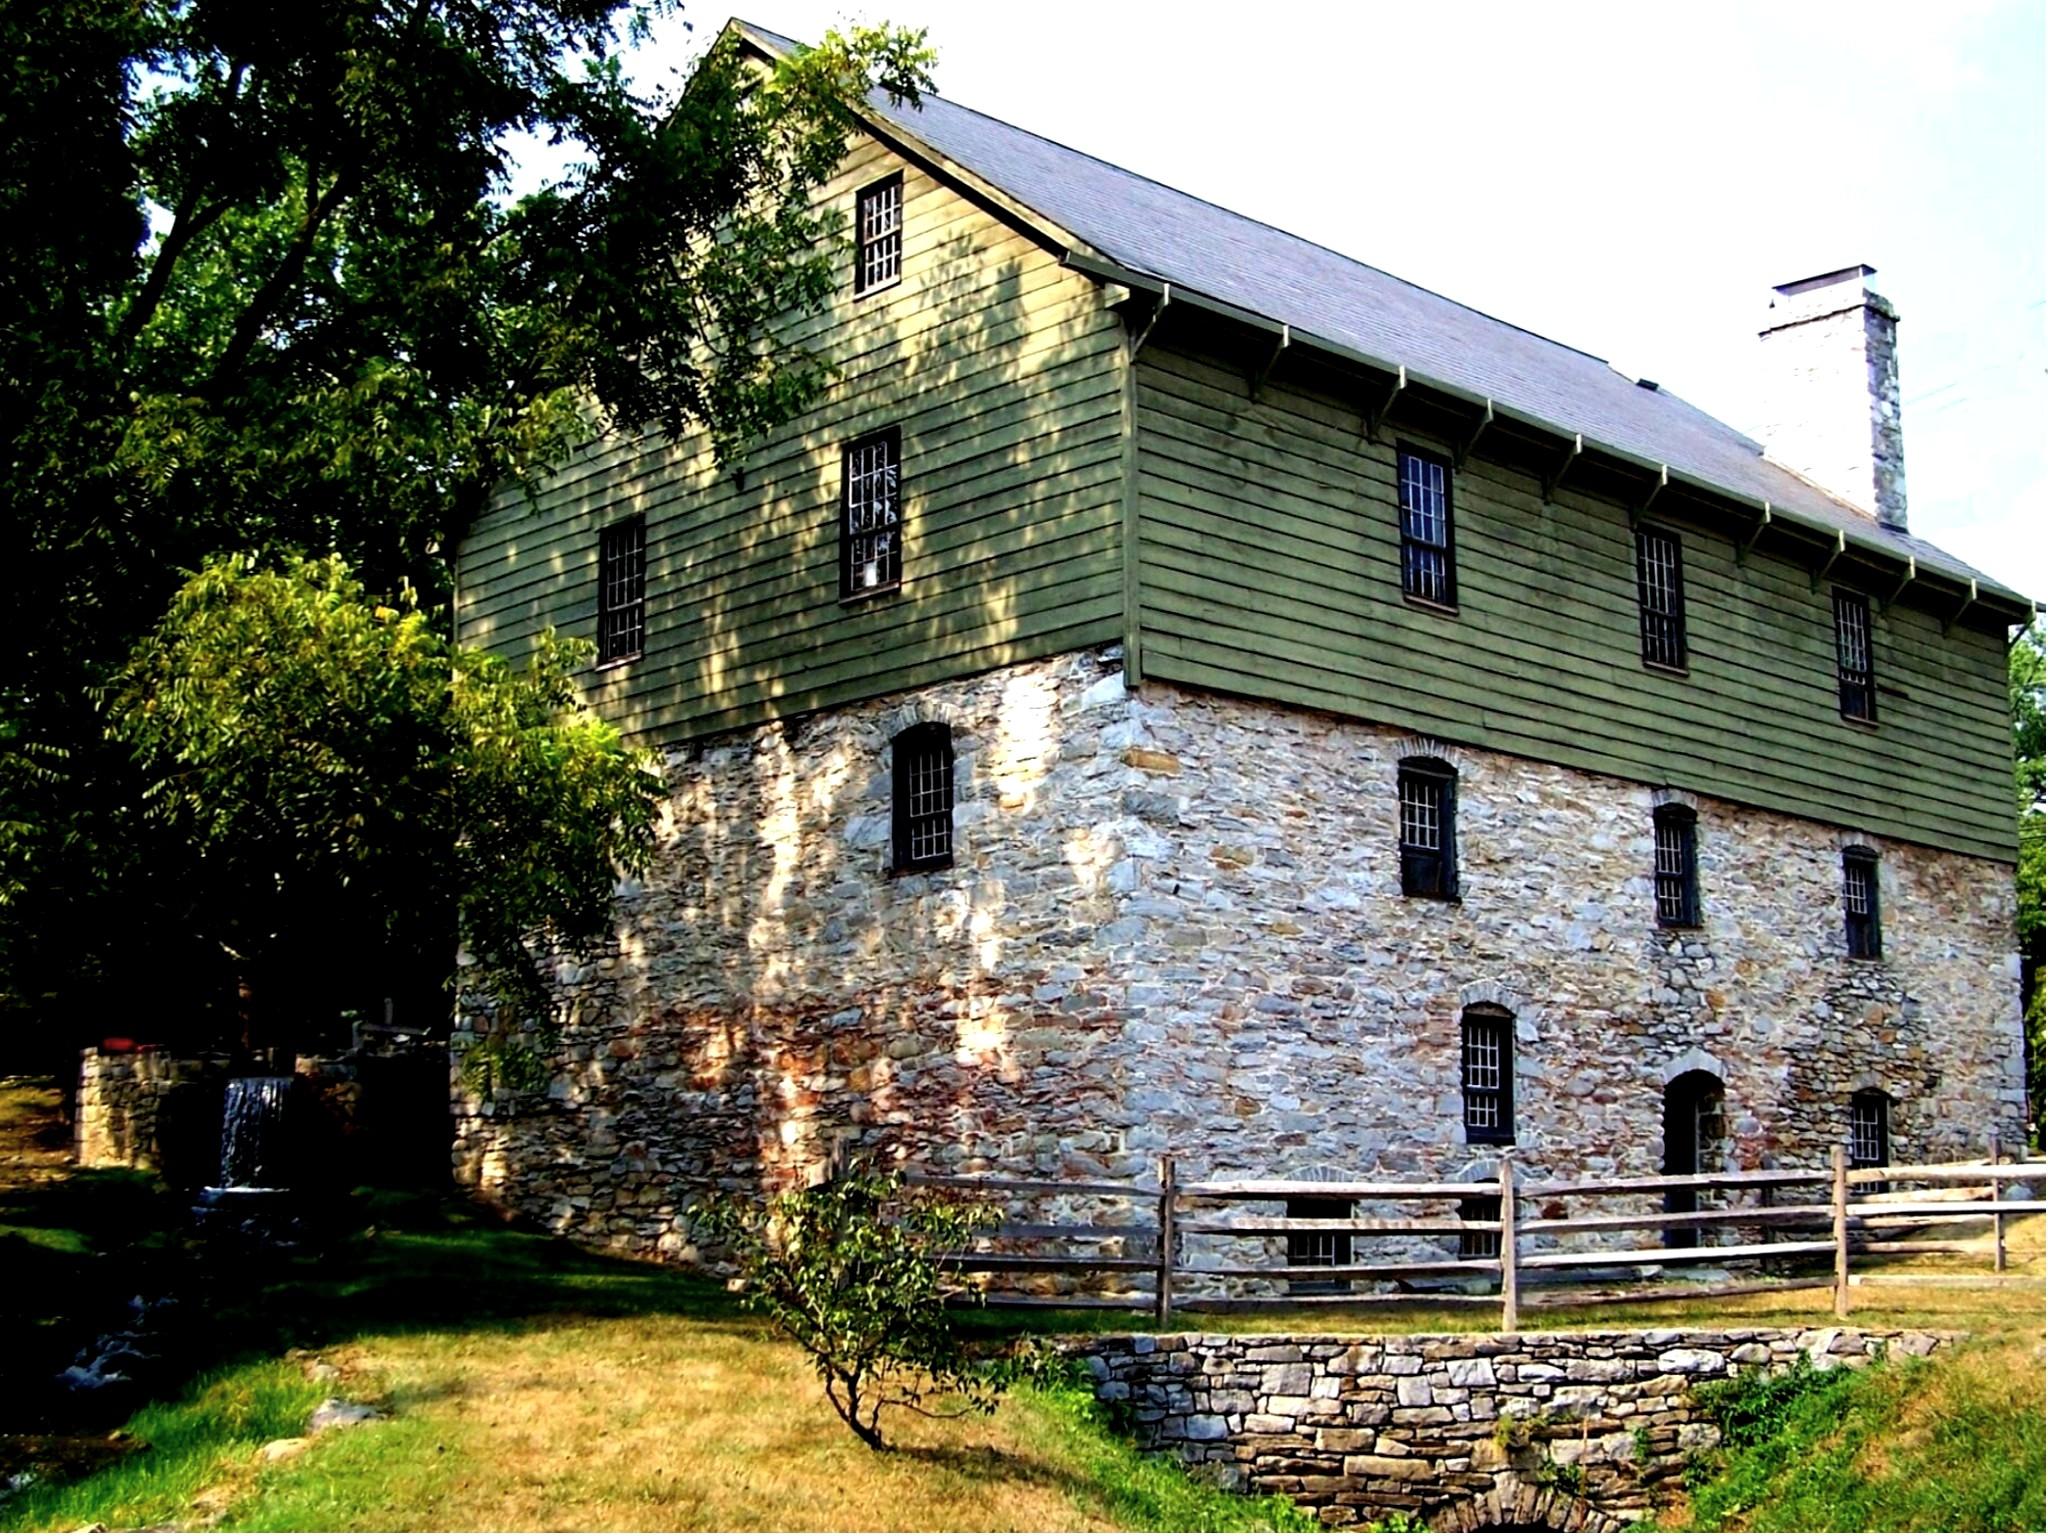 Burwell-Morgan Mill in Millwood